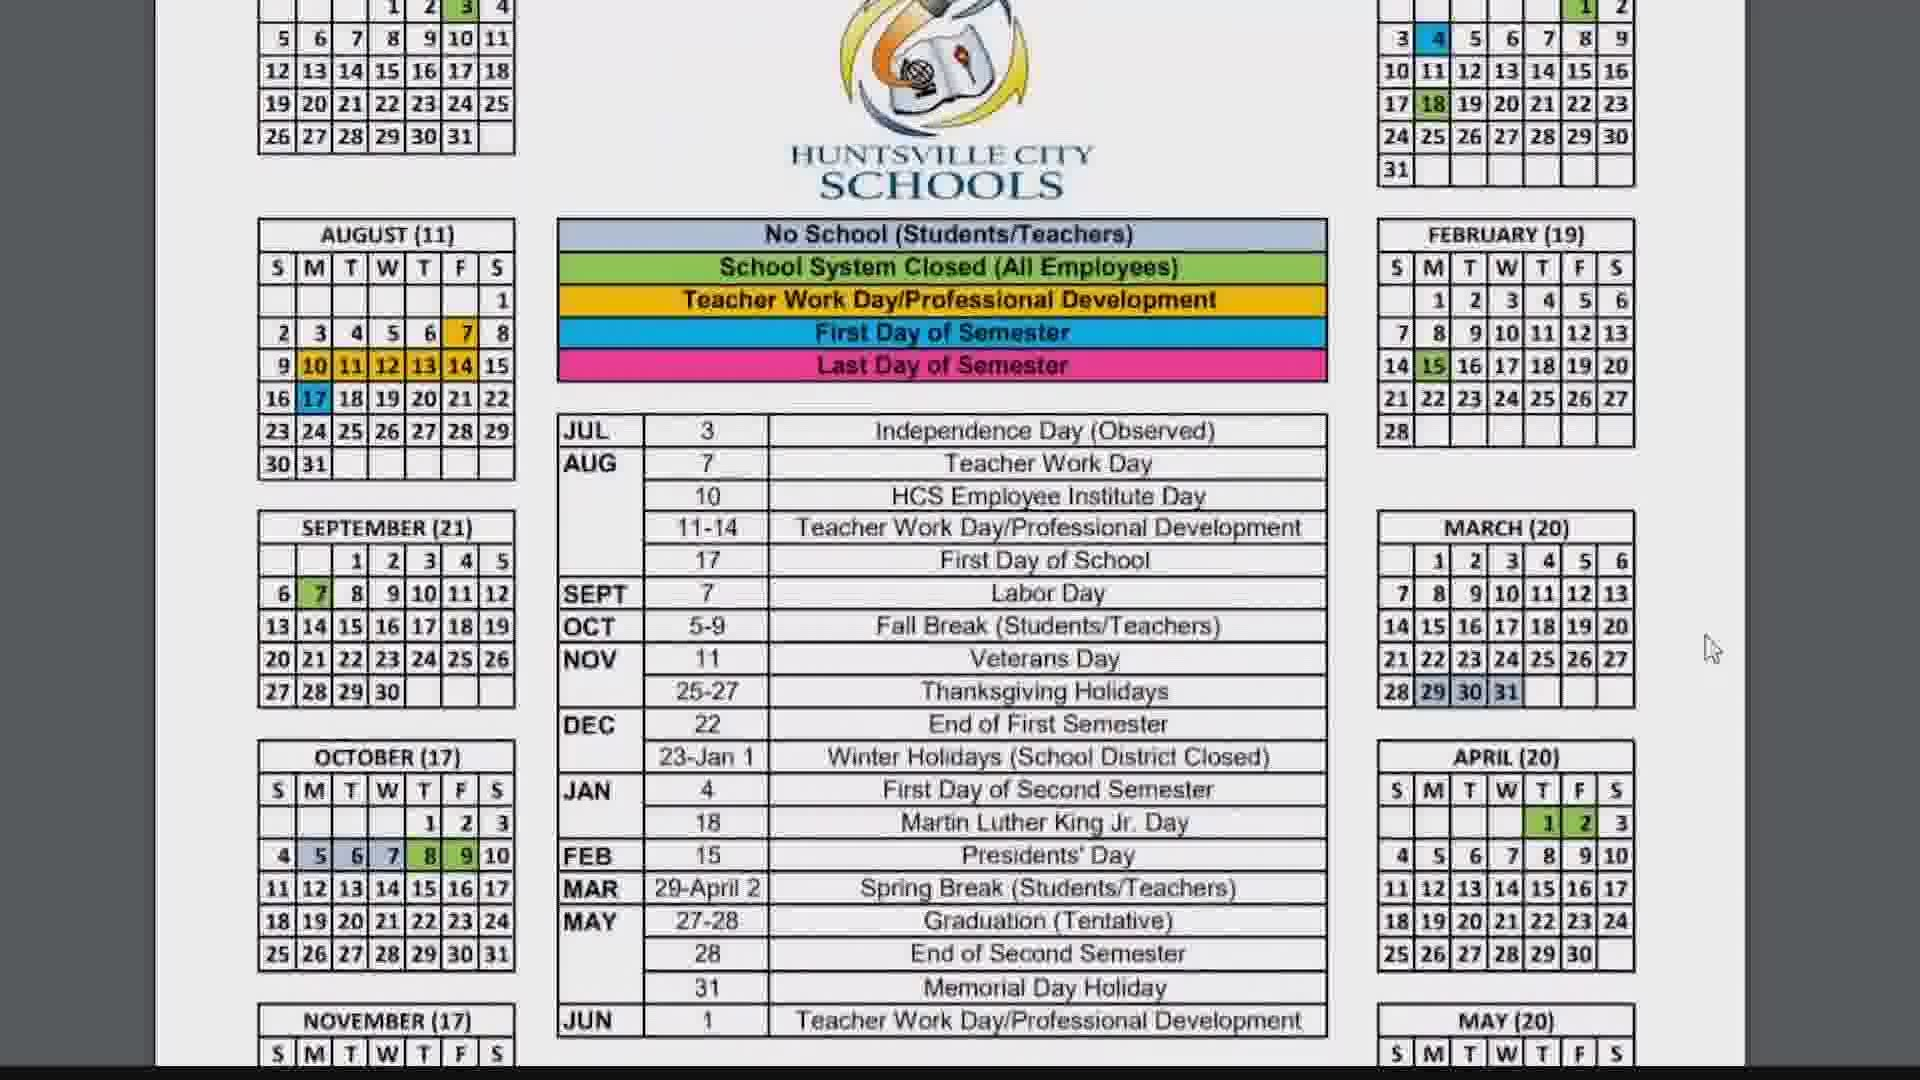 Huntsville City Schools asks community to vote on school calendar